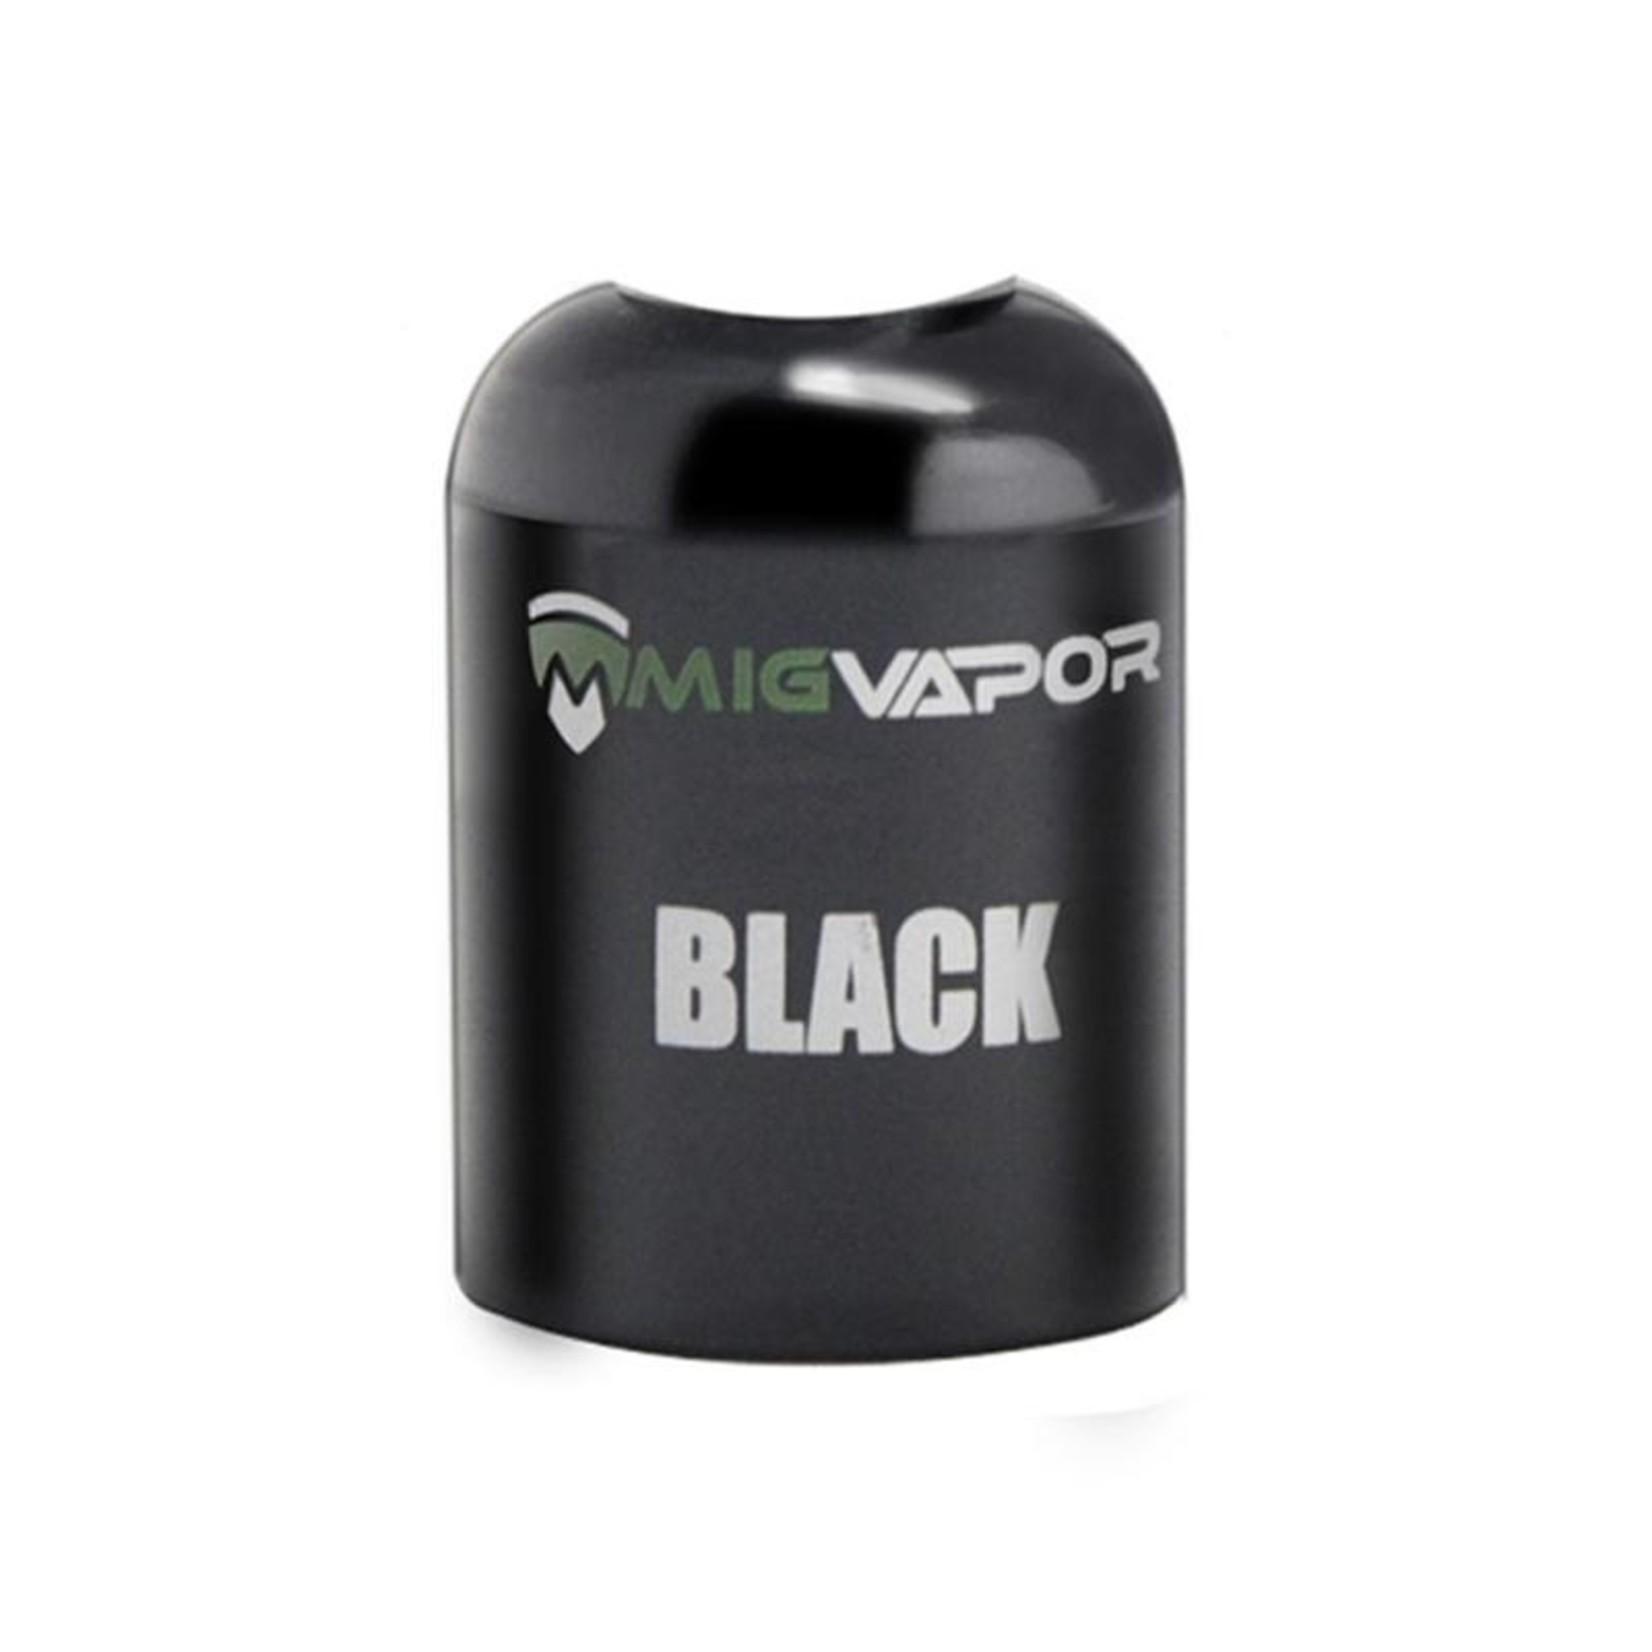 MIG Vapor BLACK Sub Herb Tank Replacement GLASS